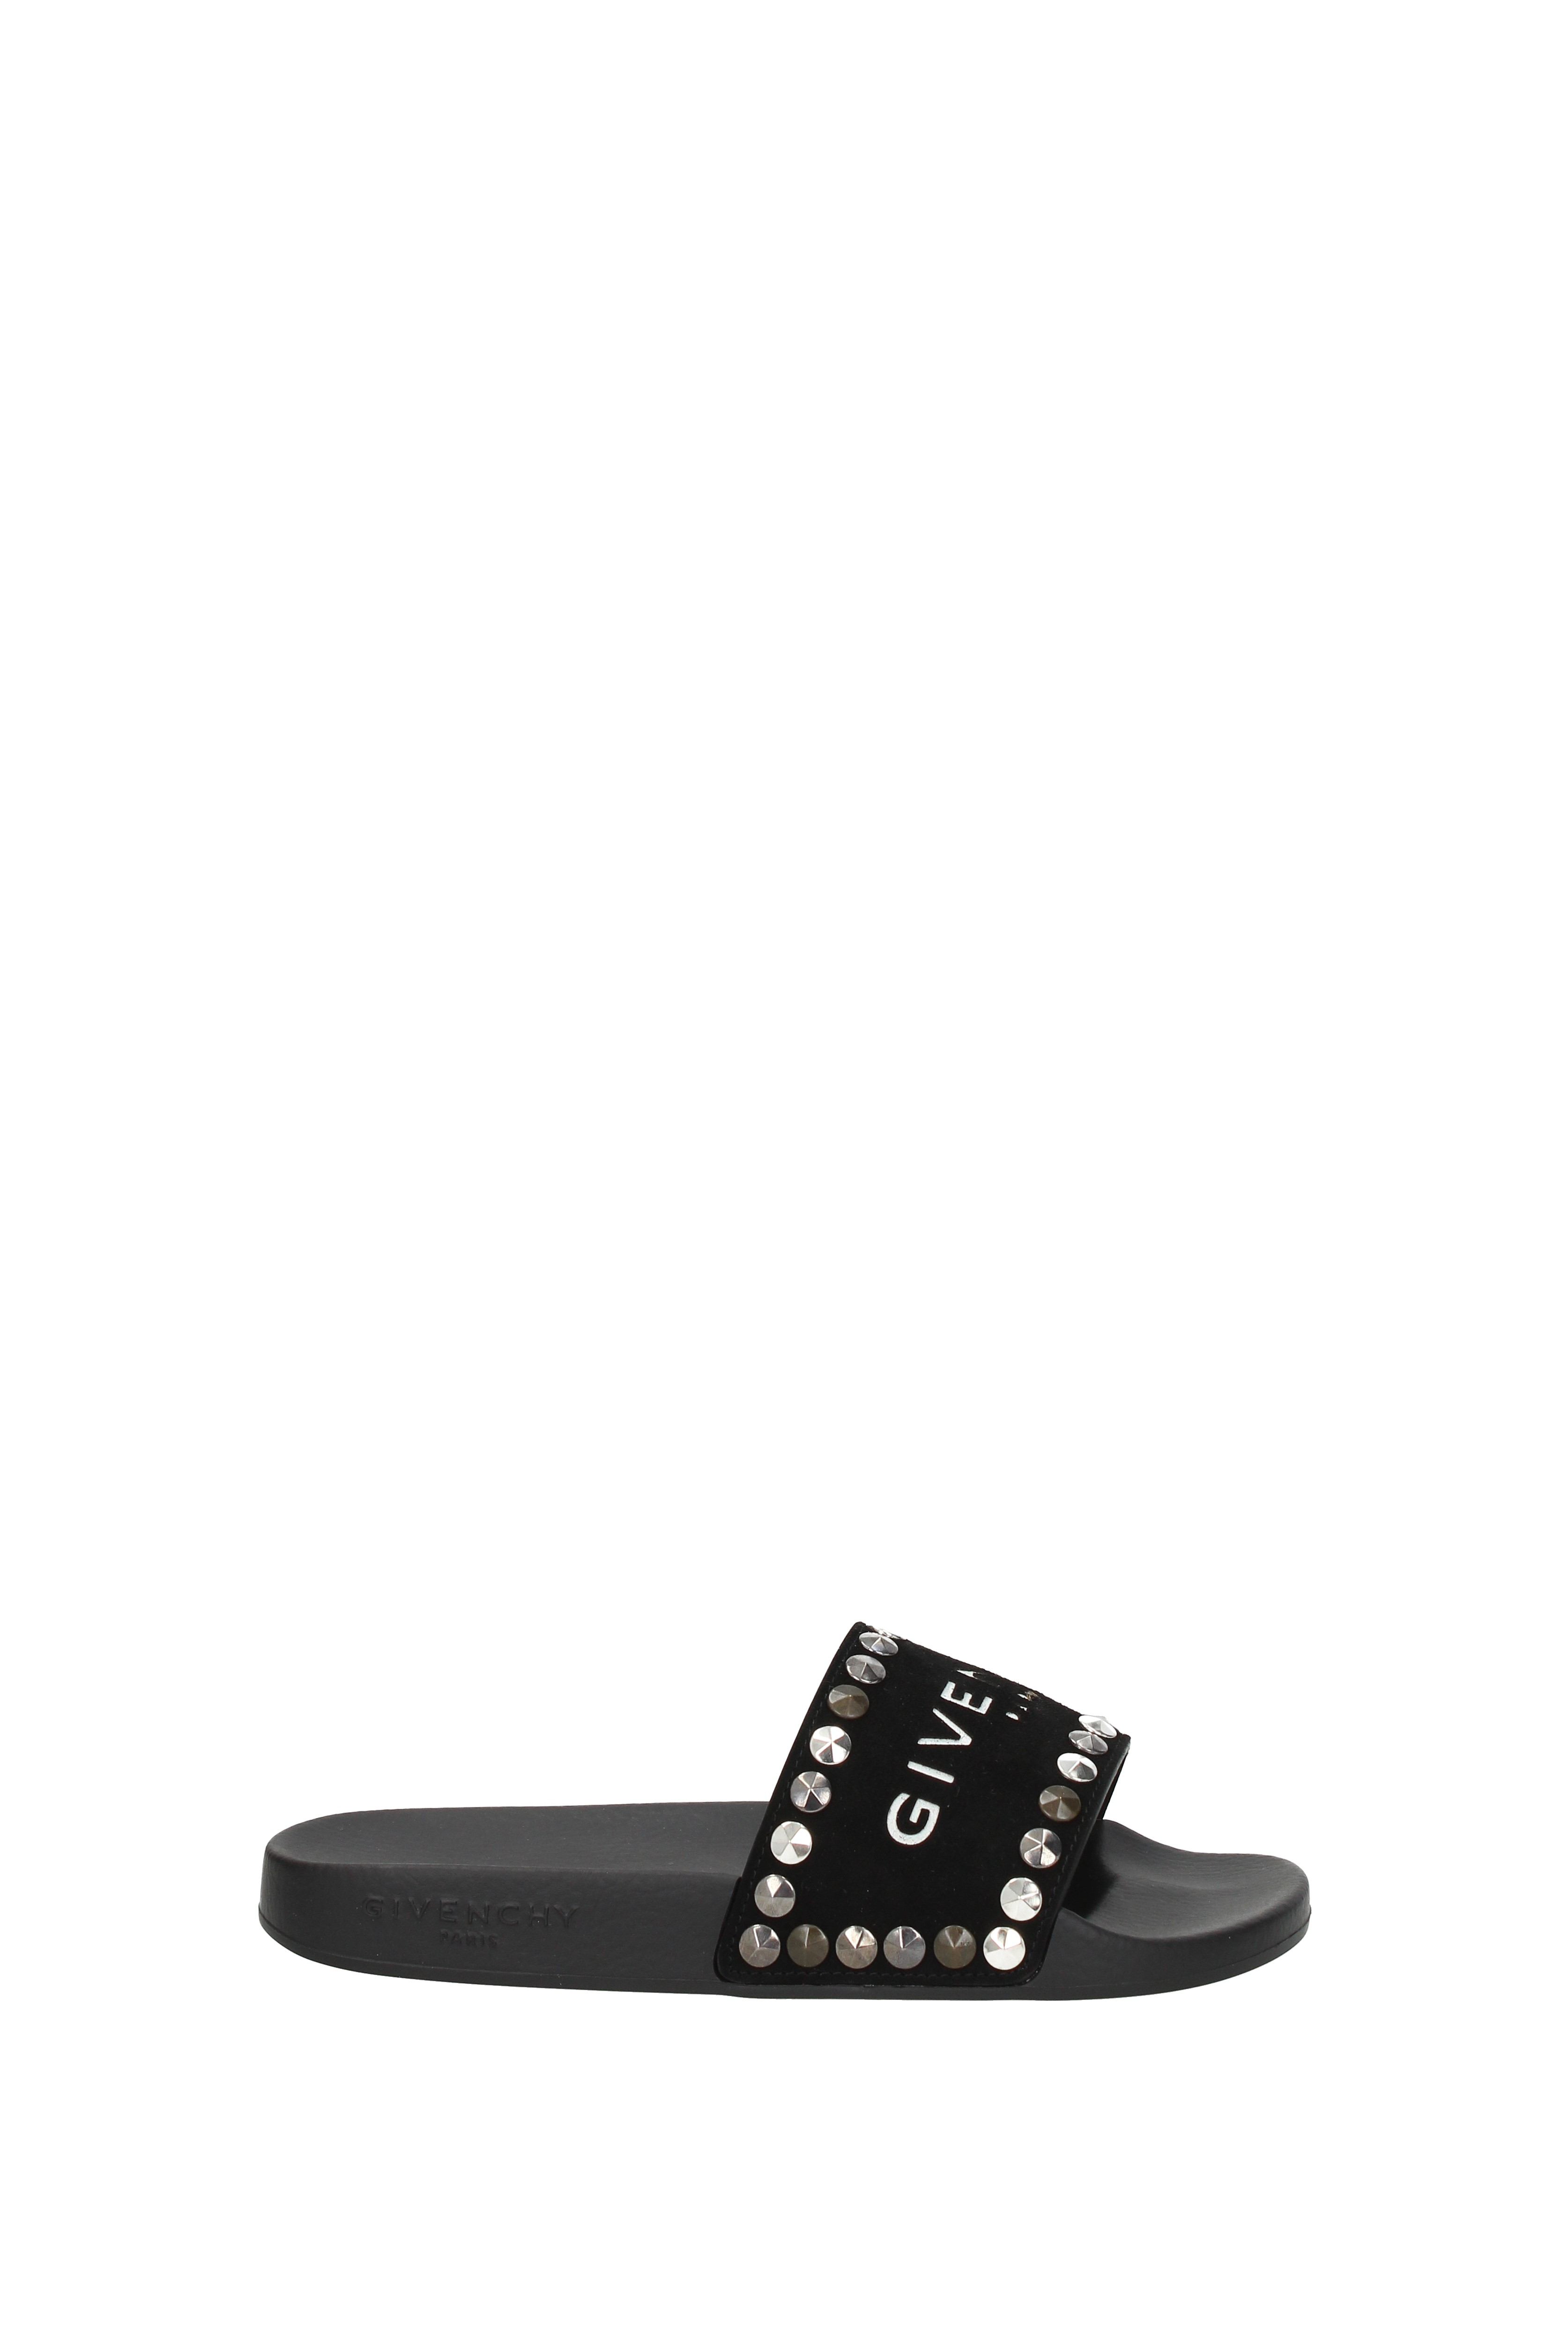 Flip-Flops und Holzschuhe Givenchy Damen Damen Damen - Wildleder (BE3004E05S) cea797